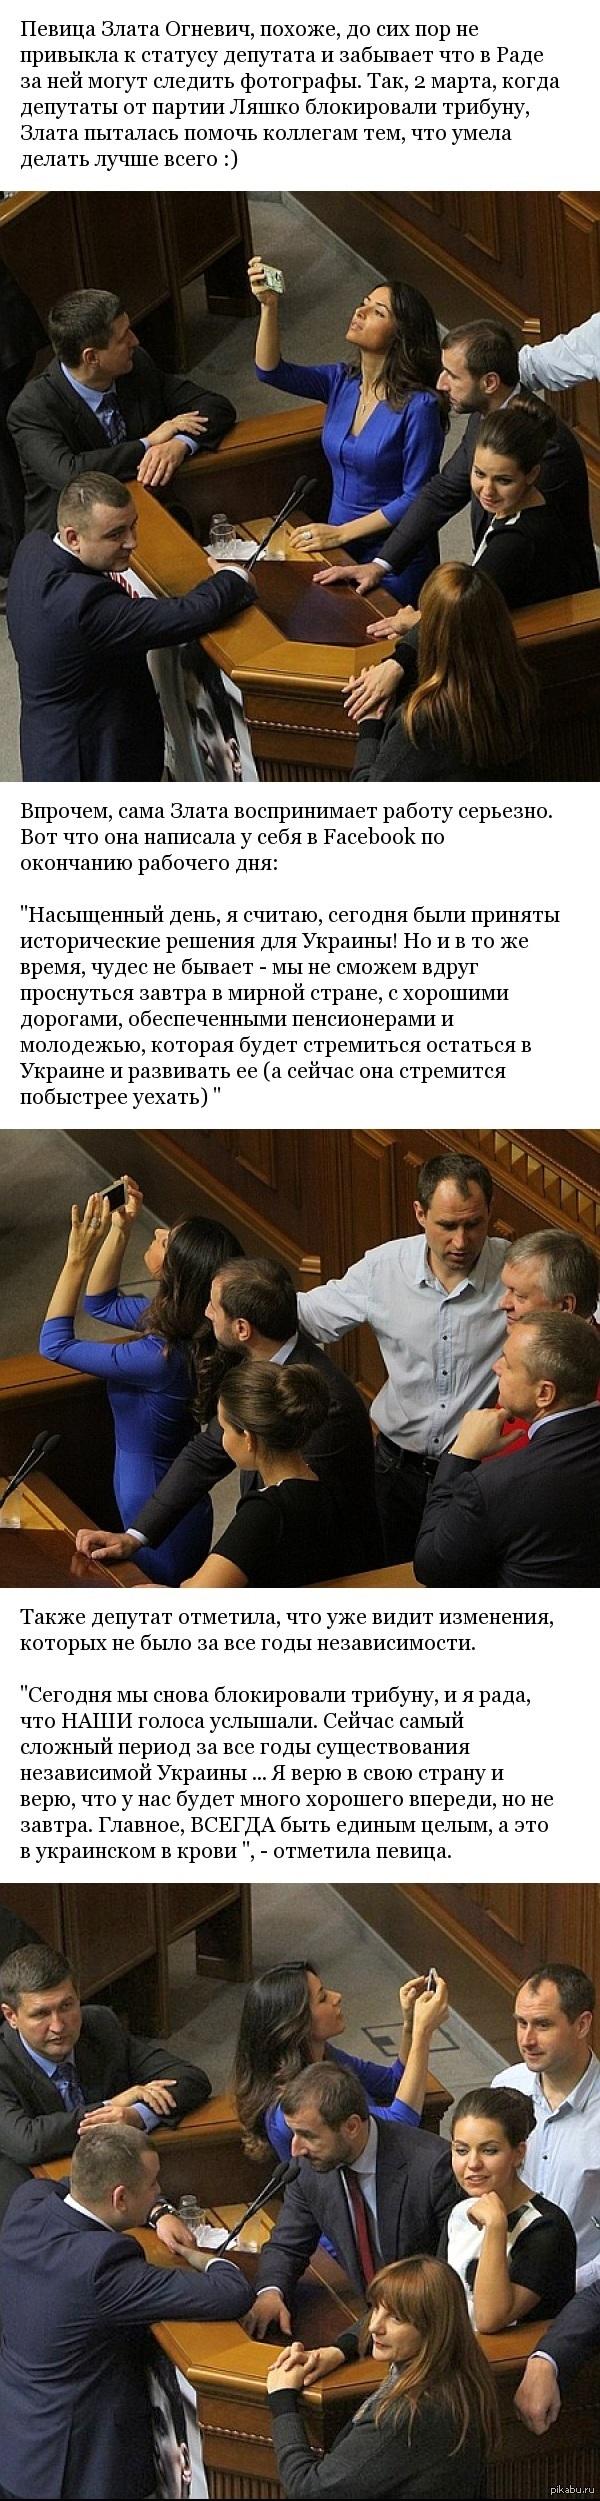 http://cs5.pikabu.ru/post_img/2015/03/03/11/1425411087_1302248599.jpg